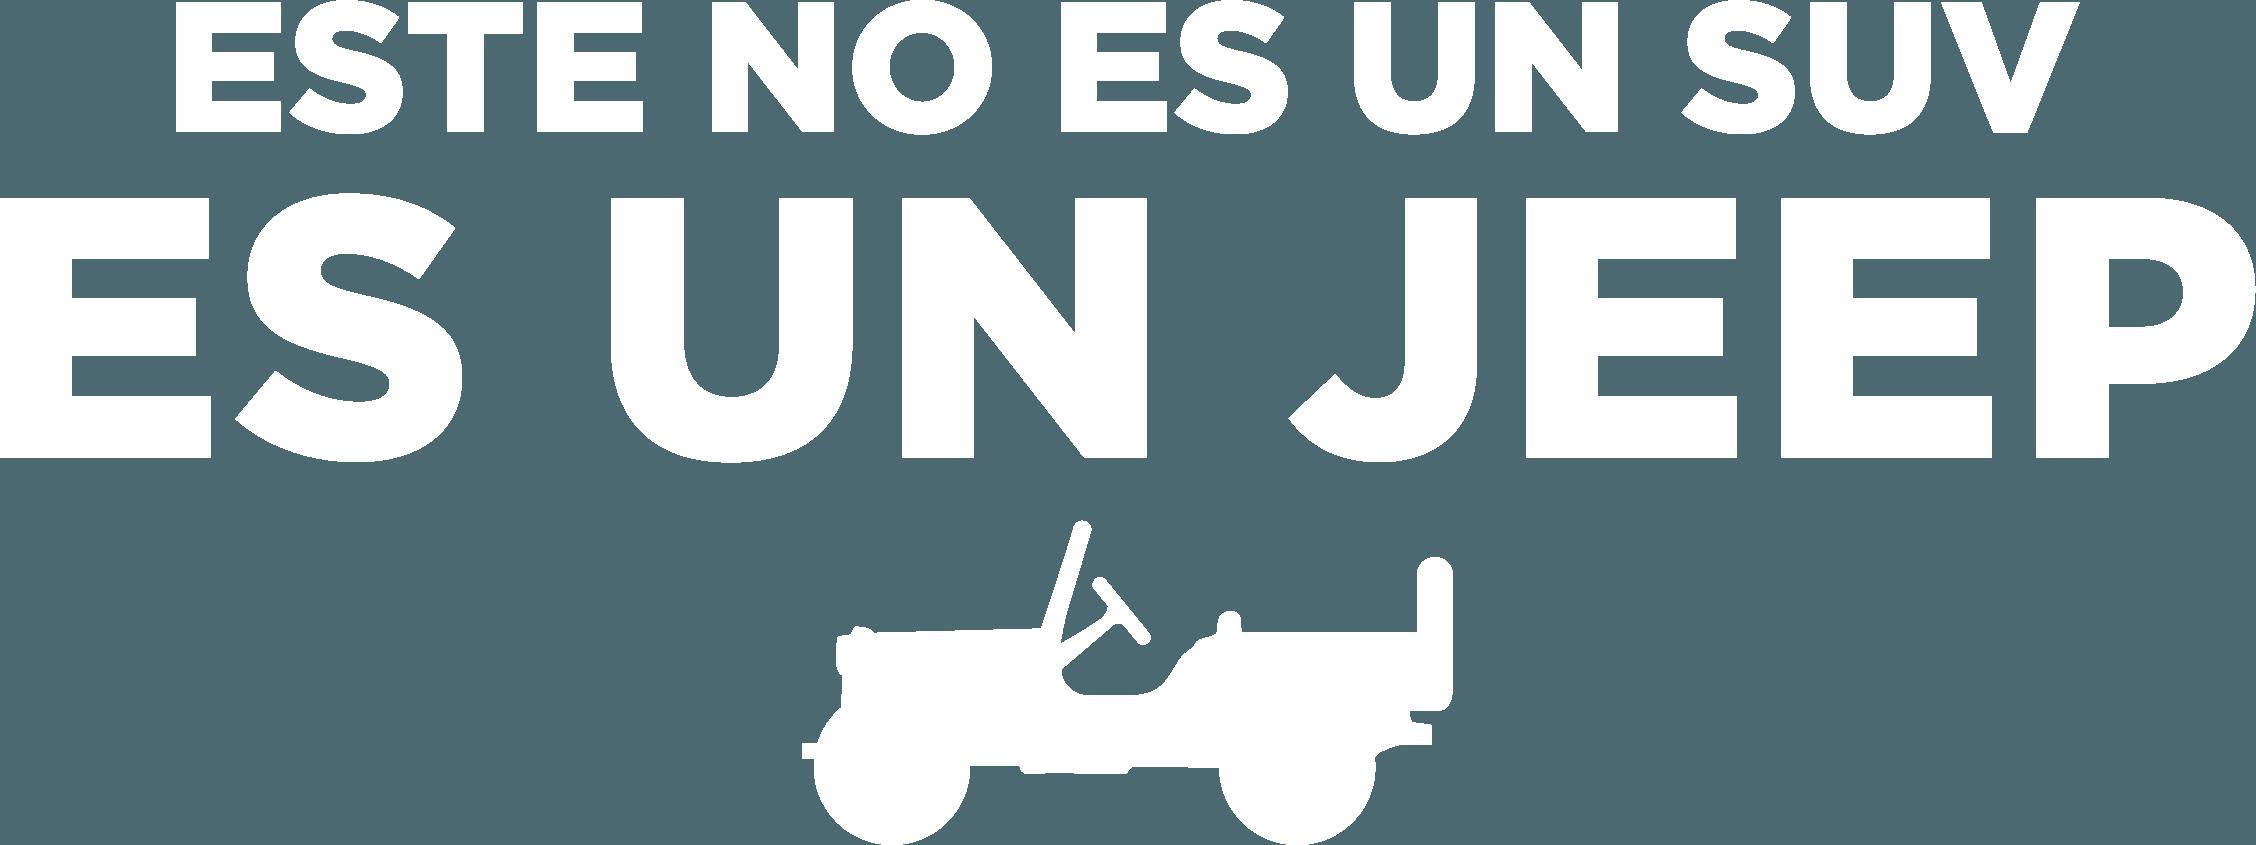 logo inferior